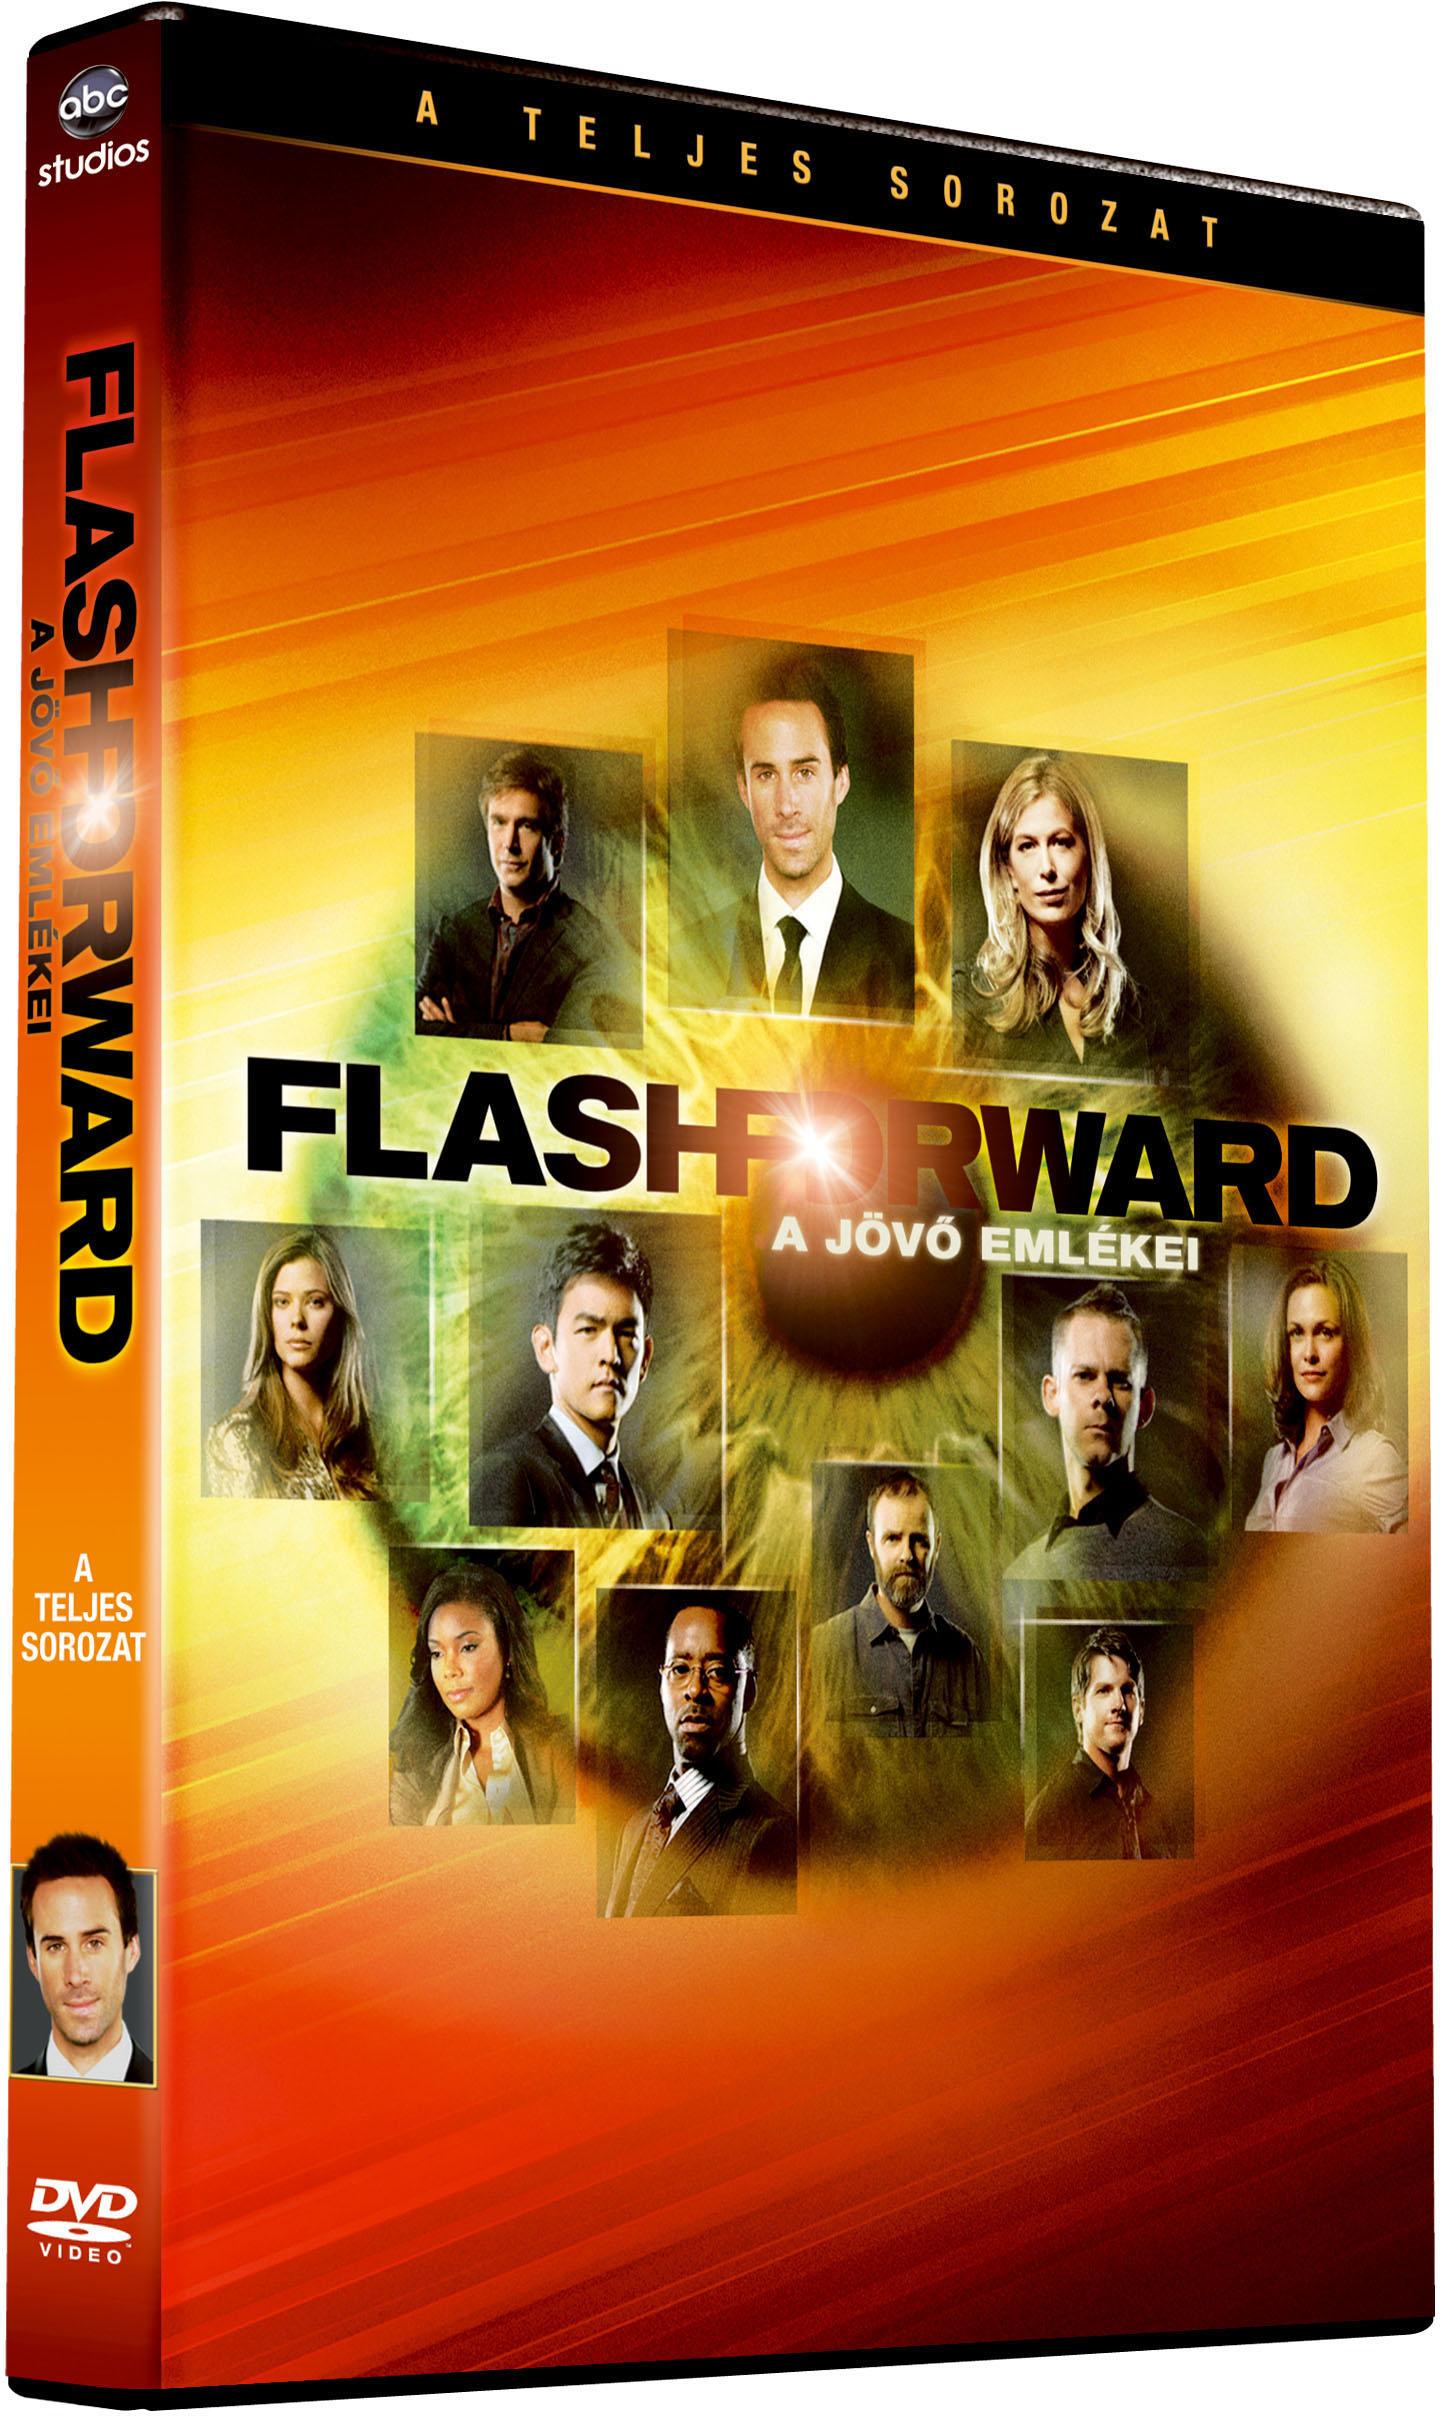 dvdabc.hu - DVD WEBSHOP, BLU-RAY WEBSHOP